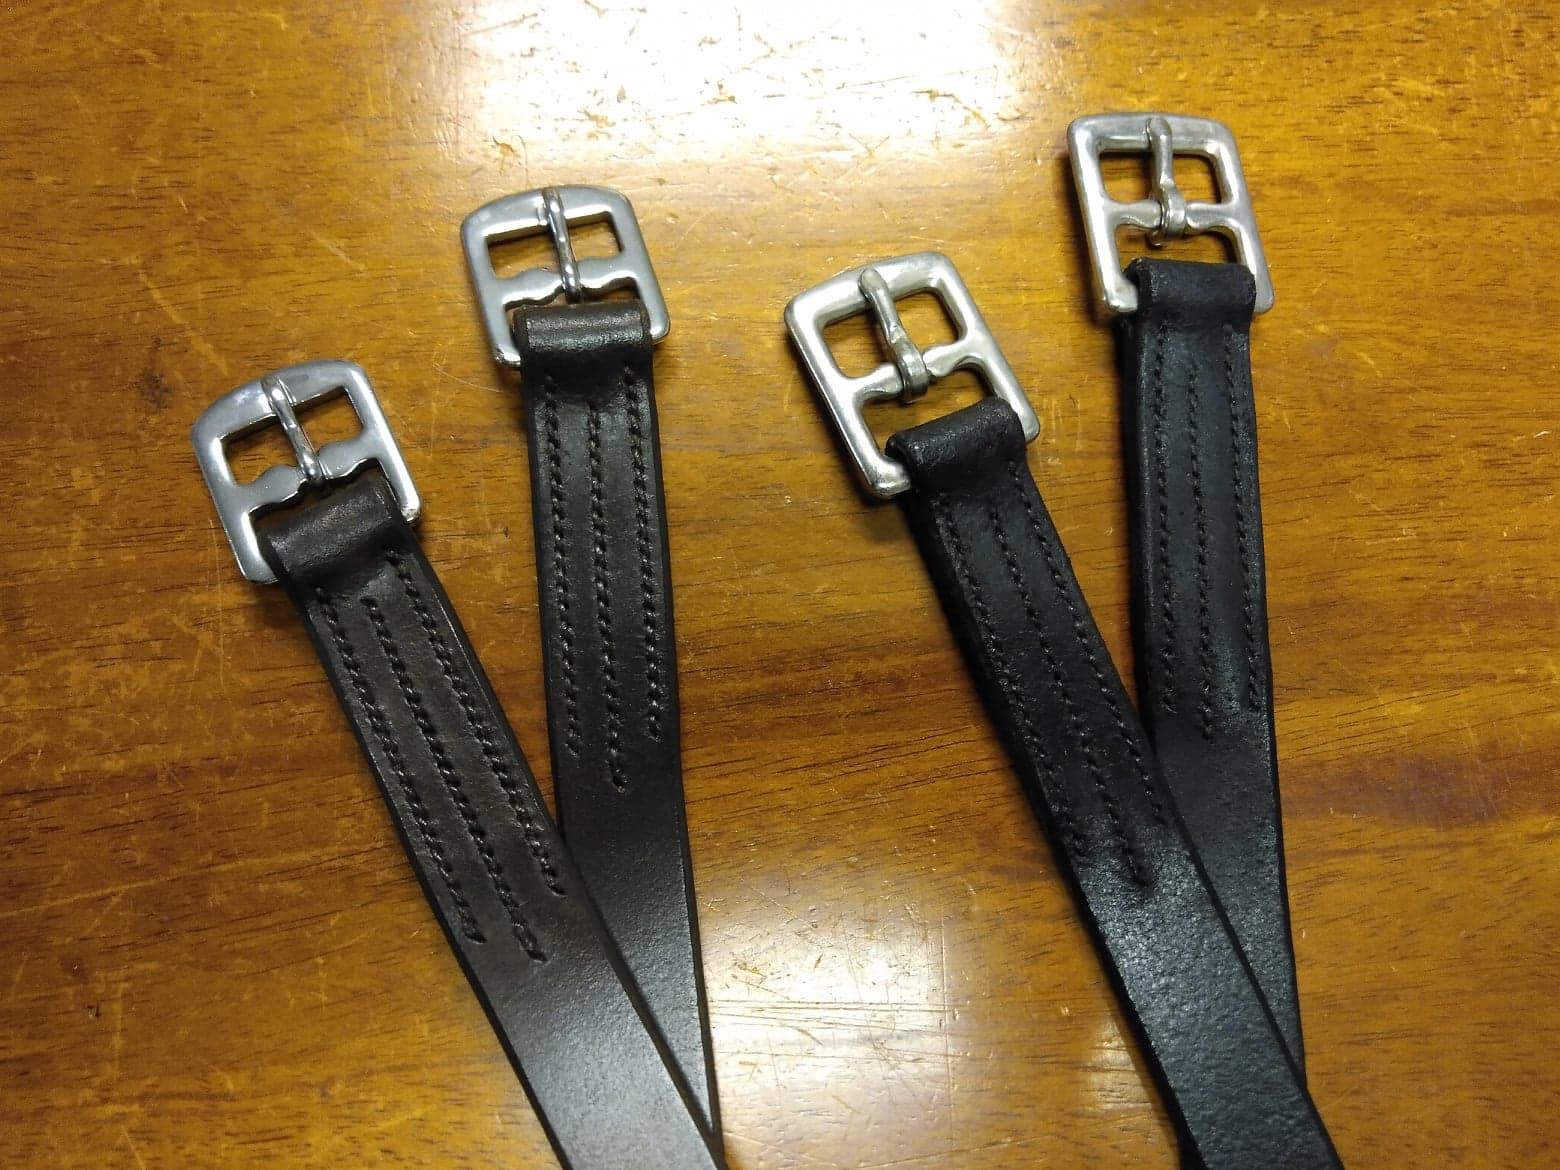 Tiny Tots Stirrup Leathers